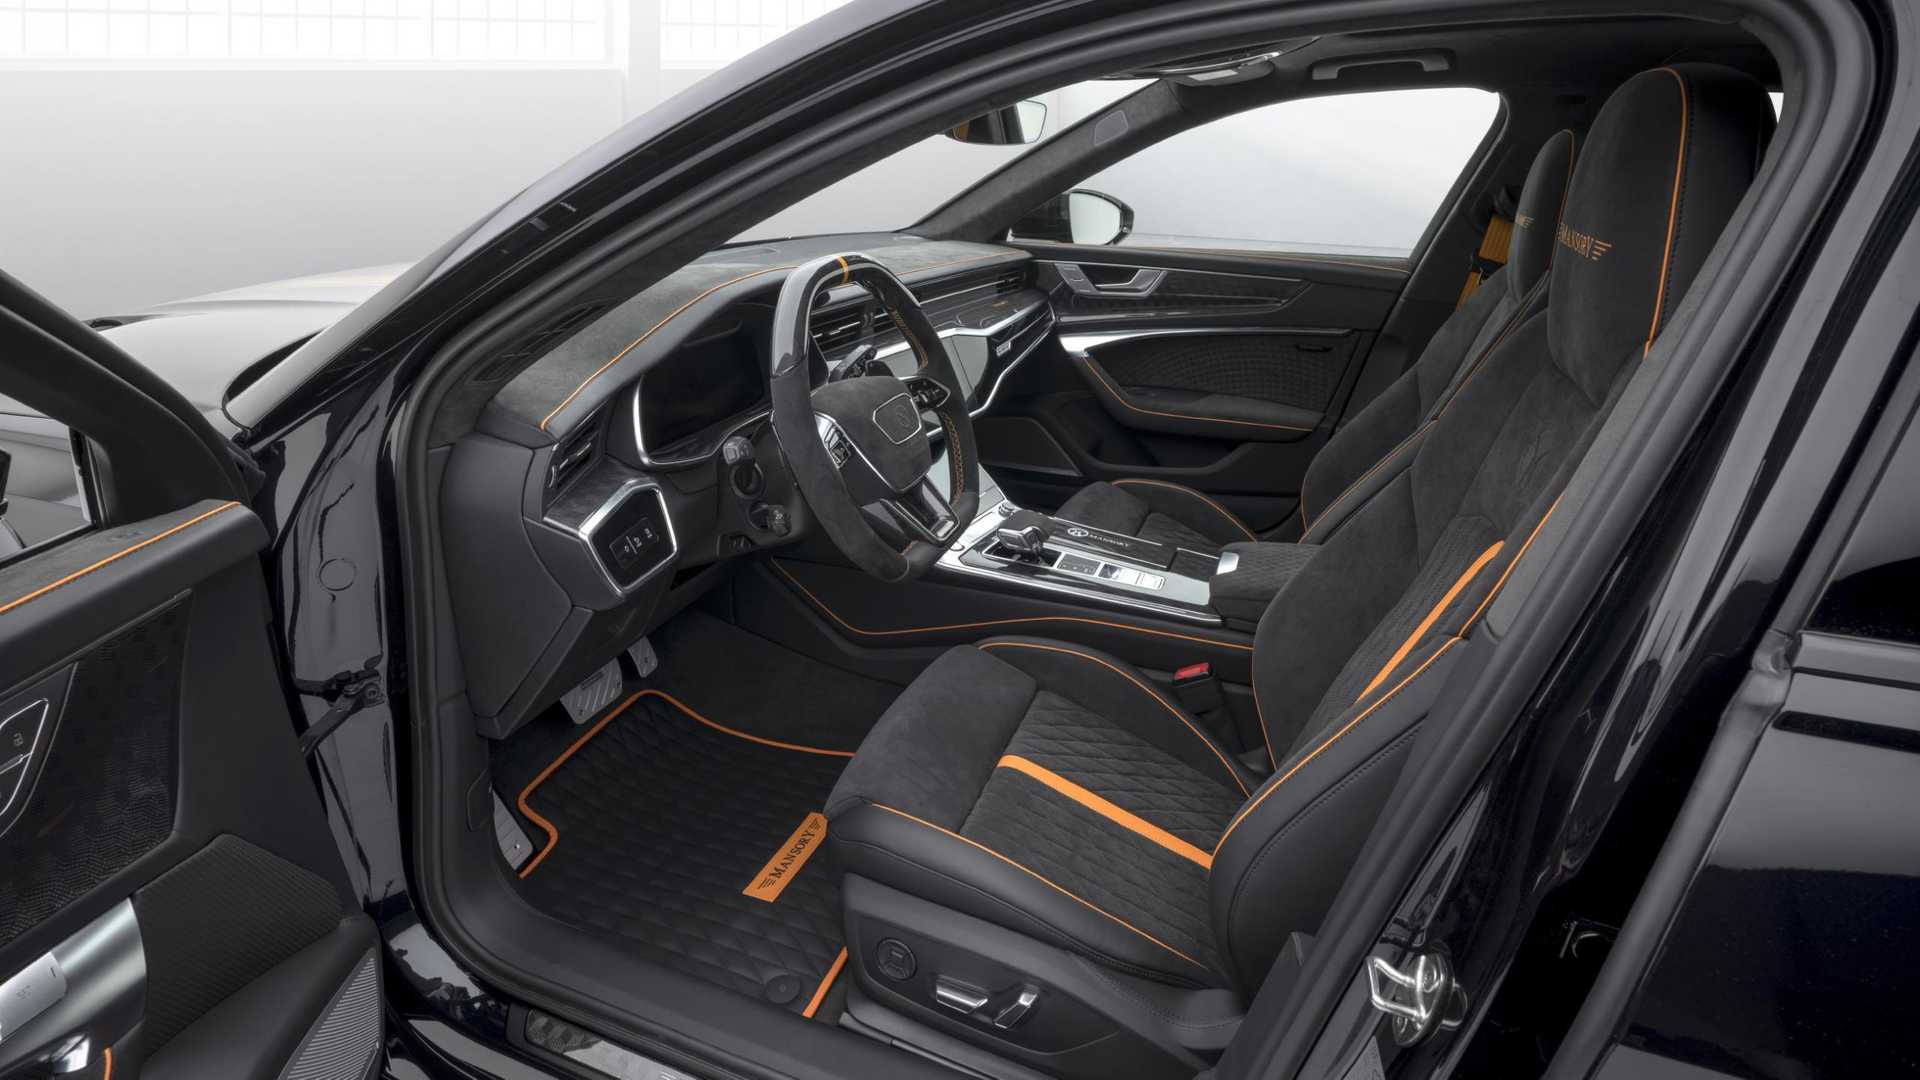 2015 Kitzbuhel Audi Home of quattro 317 110x60 photo